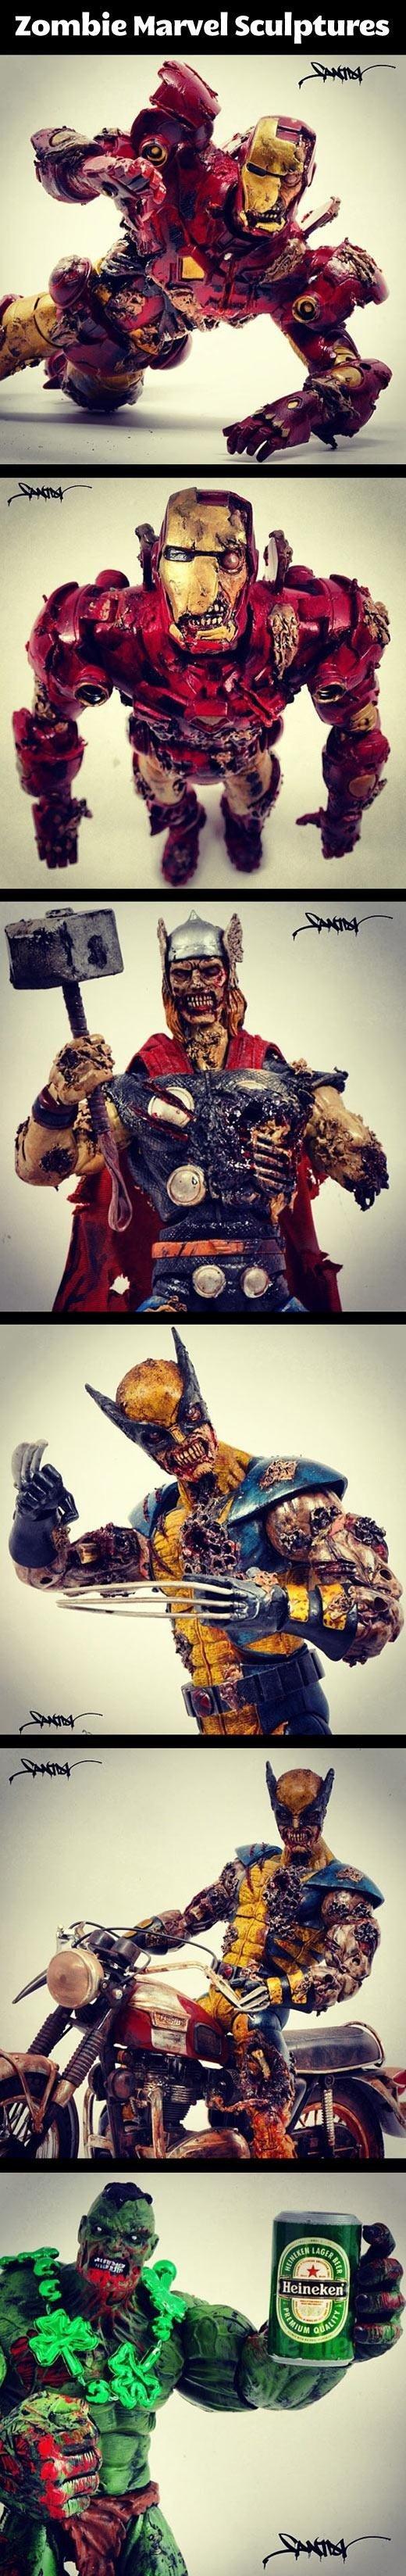 Zombie Marvel. . Zombie Marvel Sculptures. i kept hoping for deadpool... Zombie Marvel Sculptures i kept hoping for deadpool